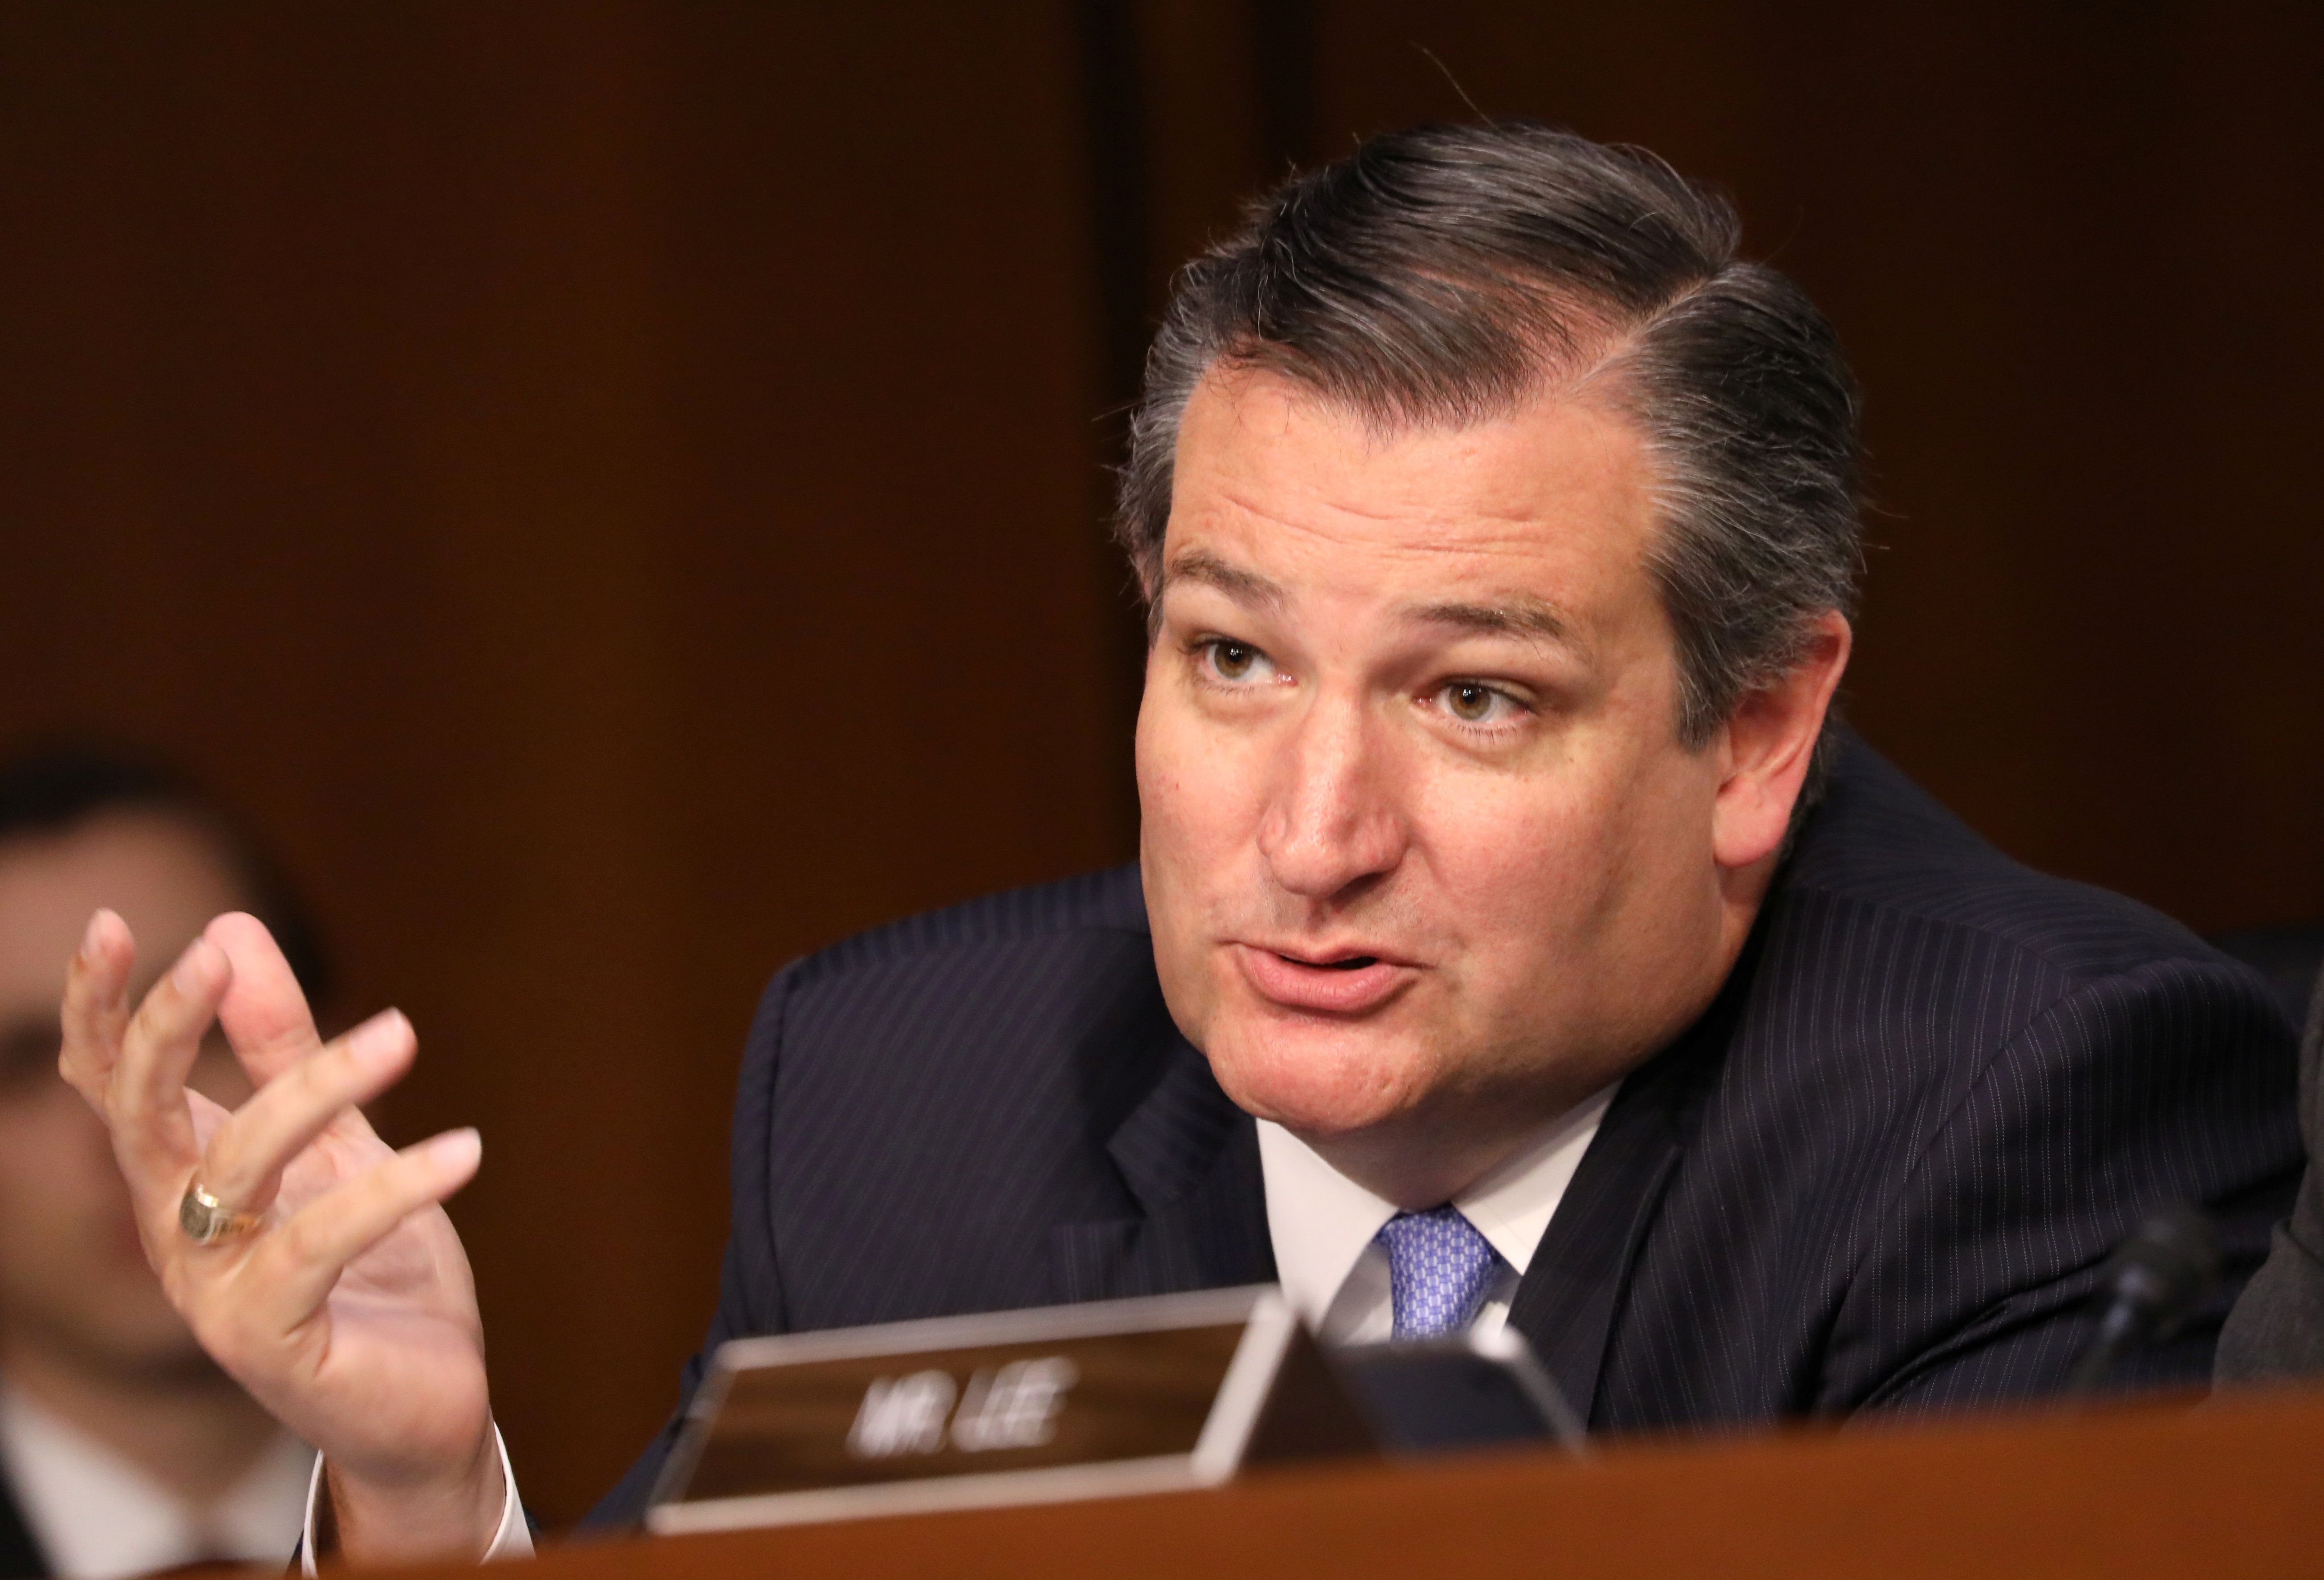 U.S. Senator Ted Cruz (R-TX) speaks during a Senate Judiciary Committee confirmation hearing for U.S. Supreme Court nominee judge Brett Kavanaugh on Capitol Hill in Washington, U.S., September 4, 2018. REUTERS/Chris Wattie